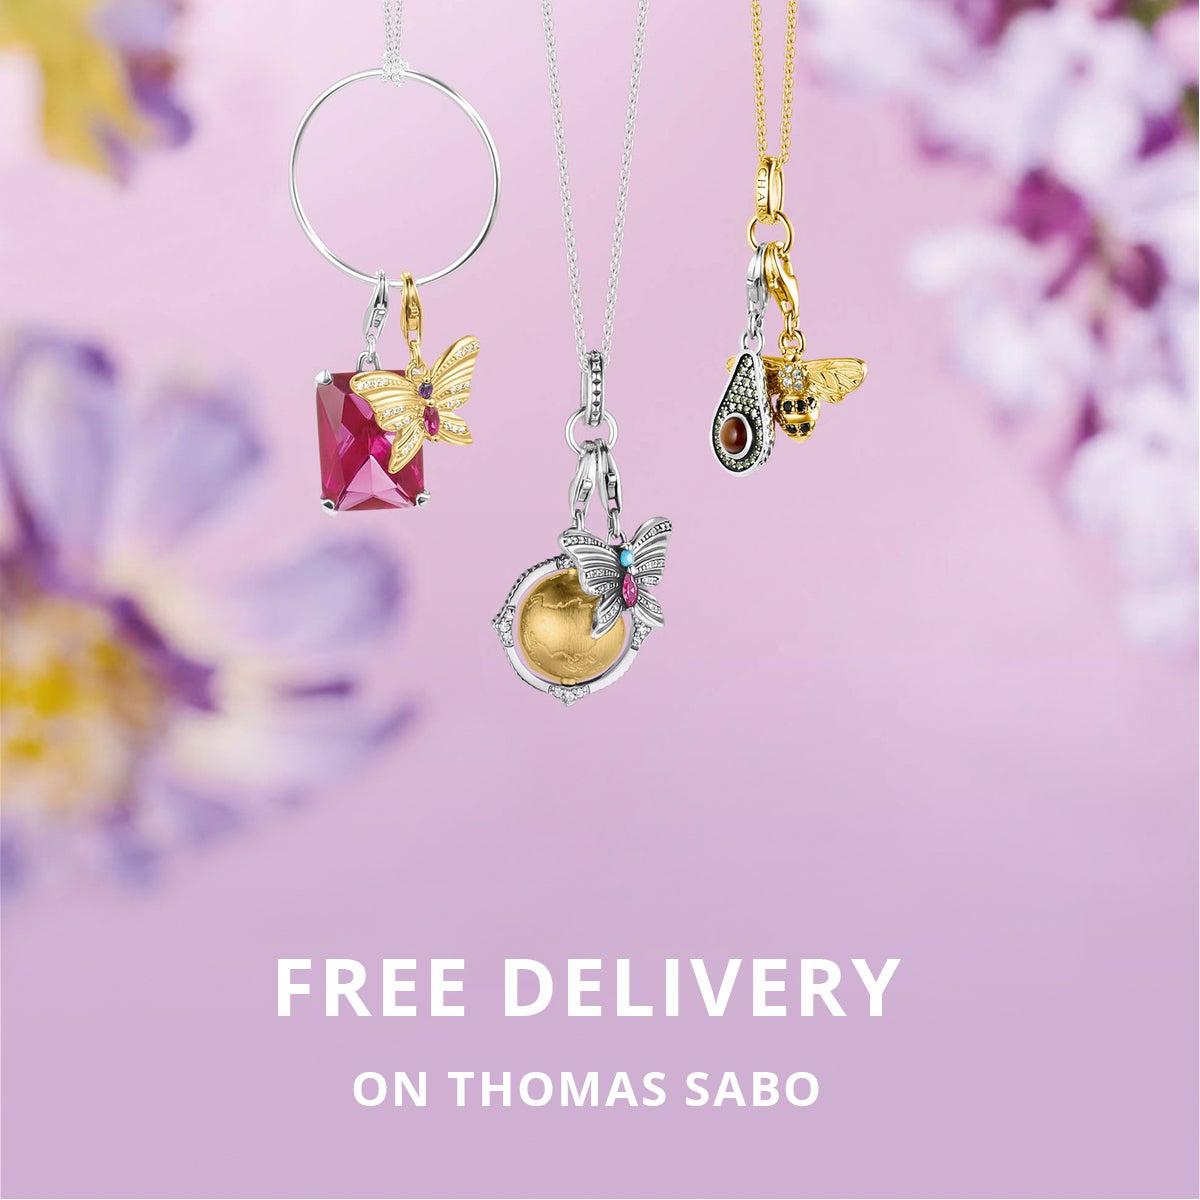 Thomas Sabo Free Delivery